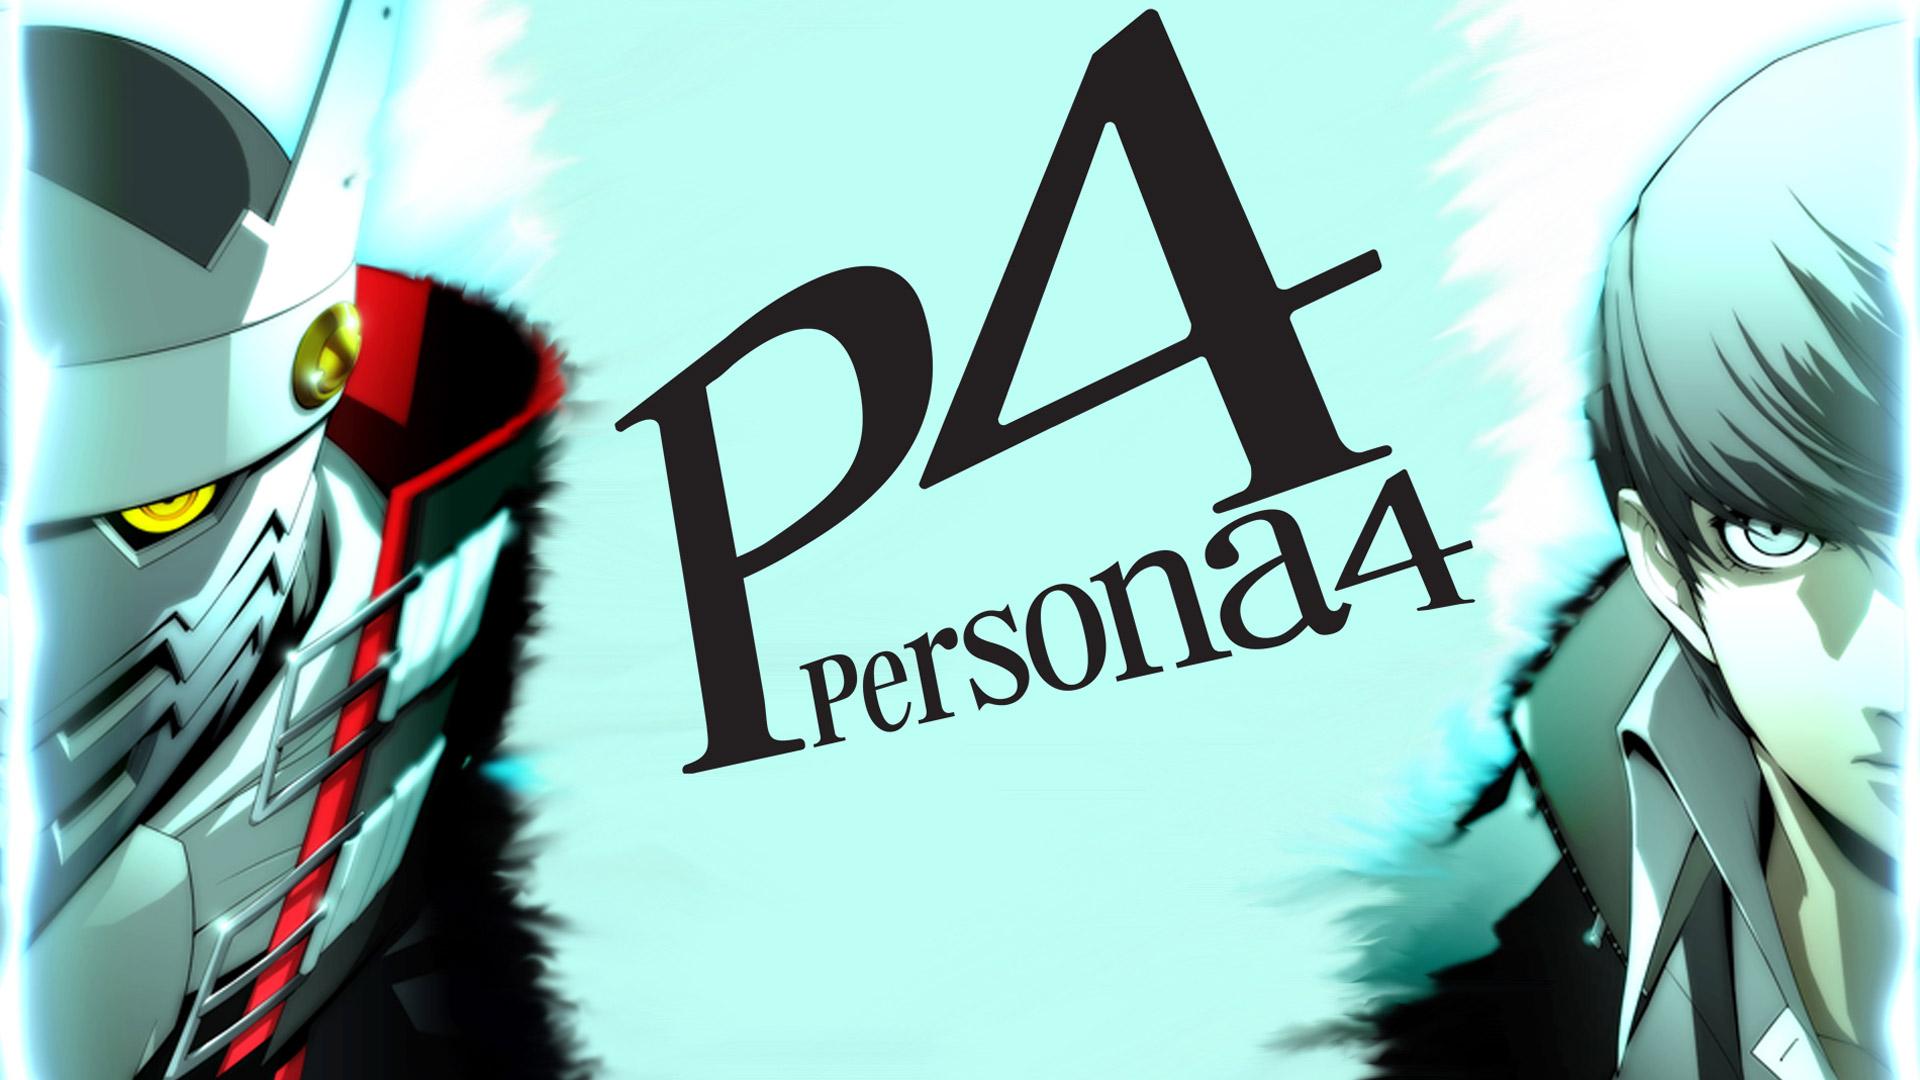 Free Persona 4 Wallpaper In 1920x1080